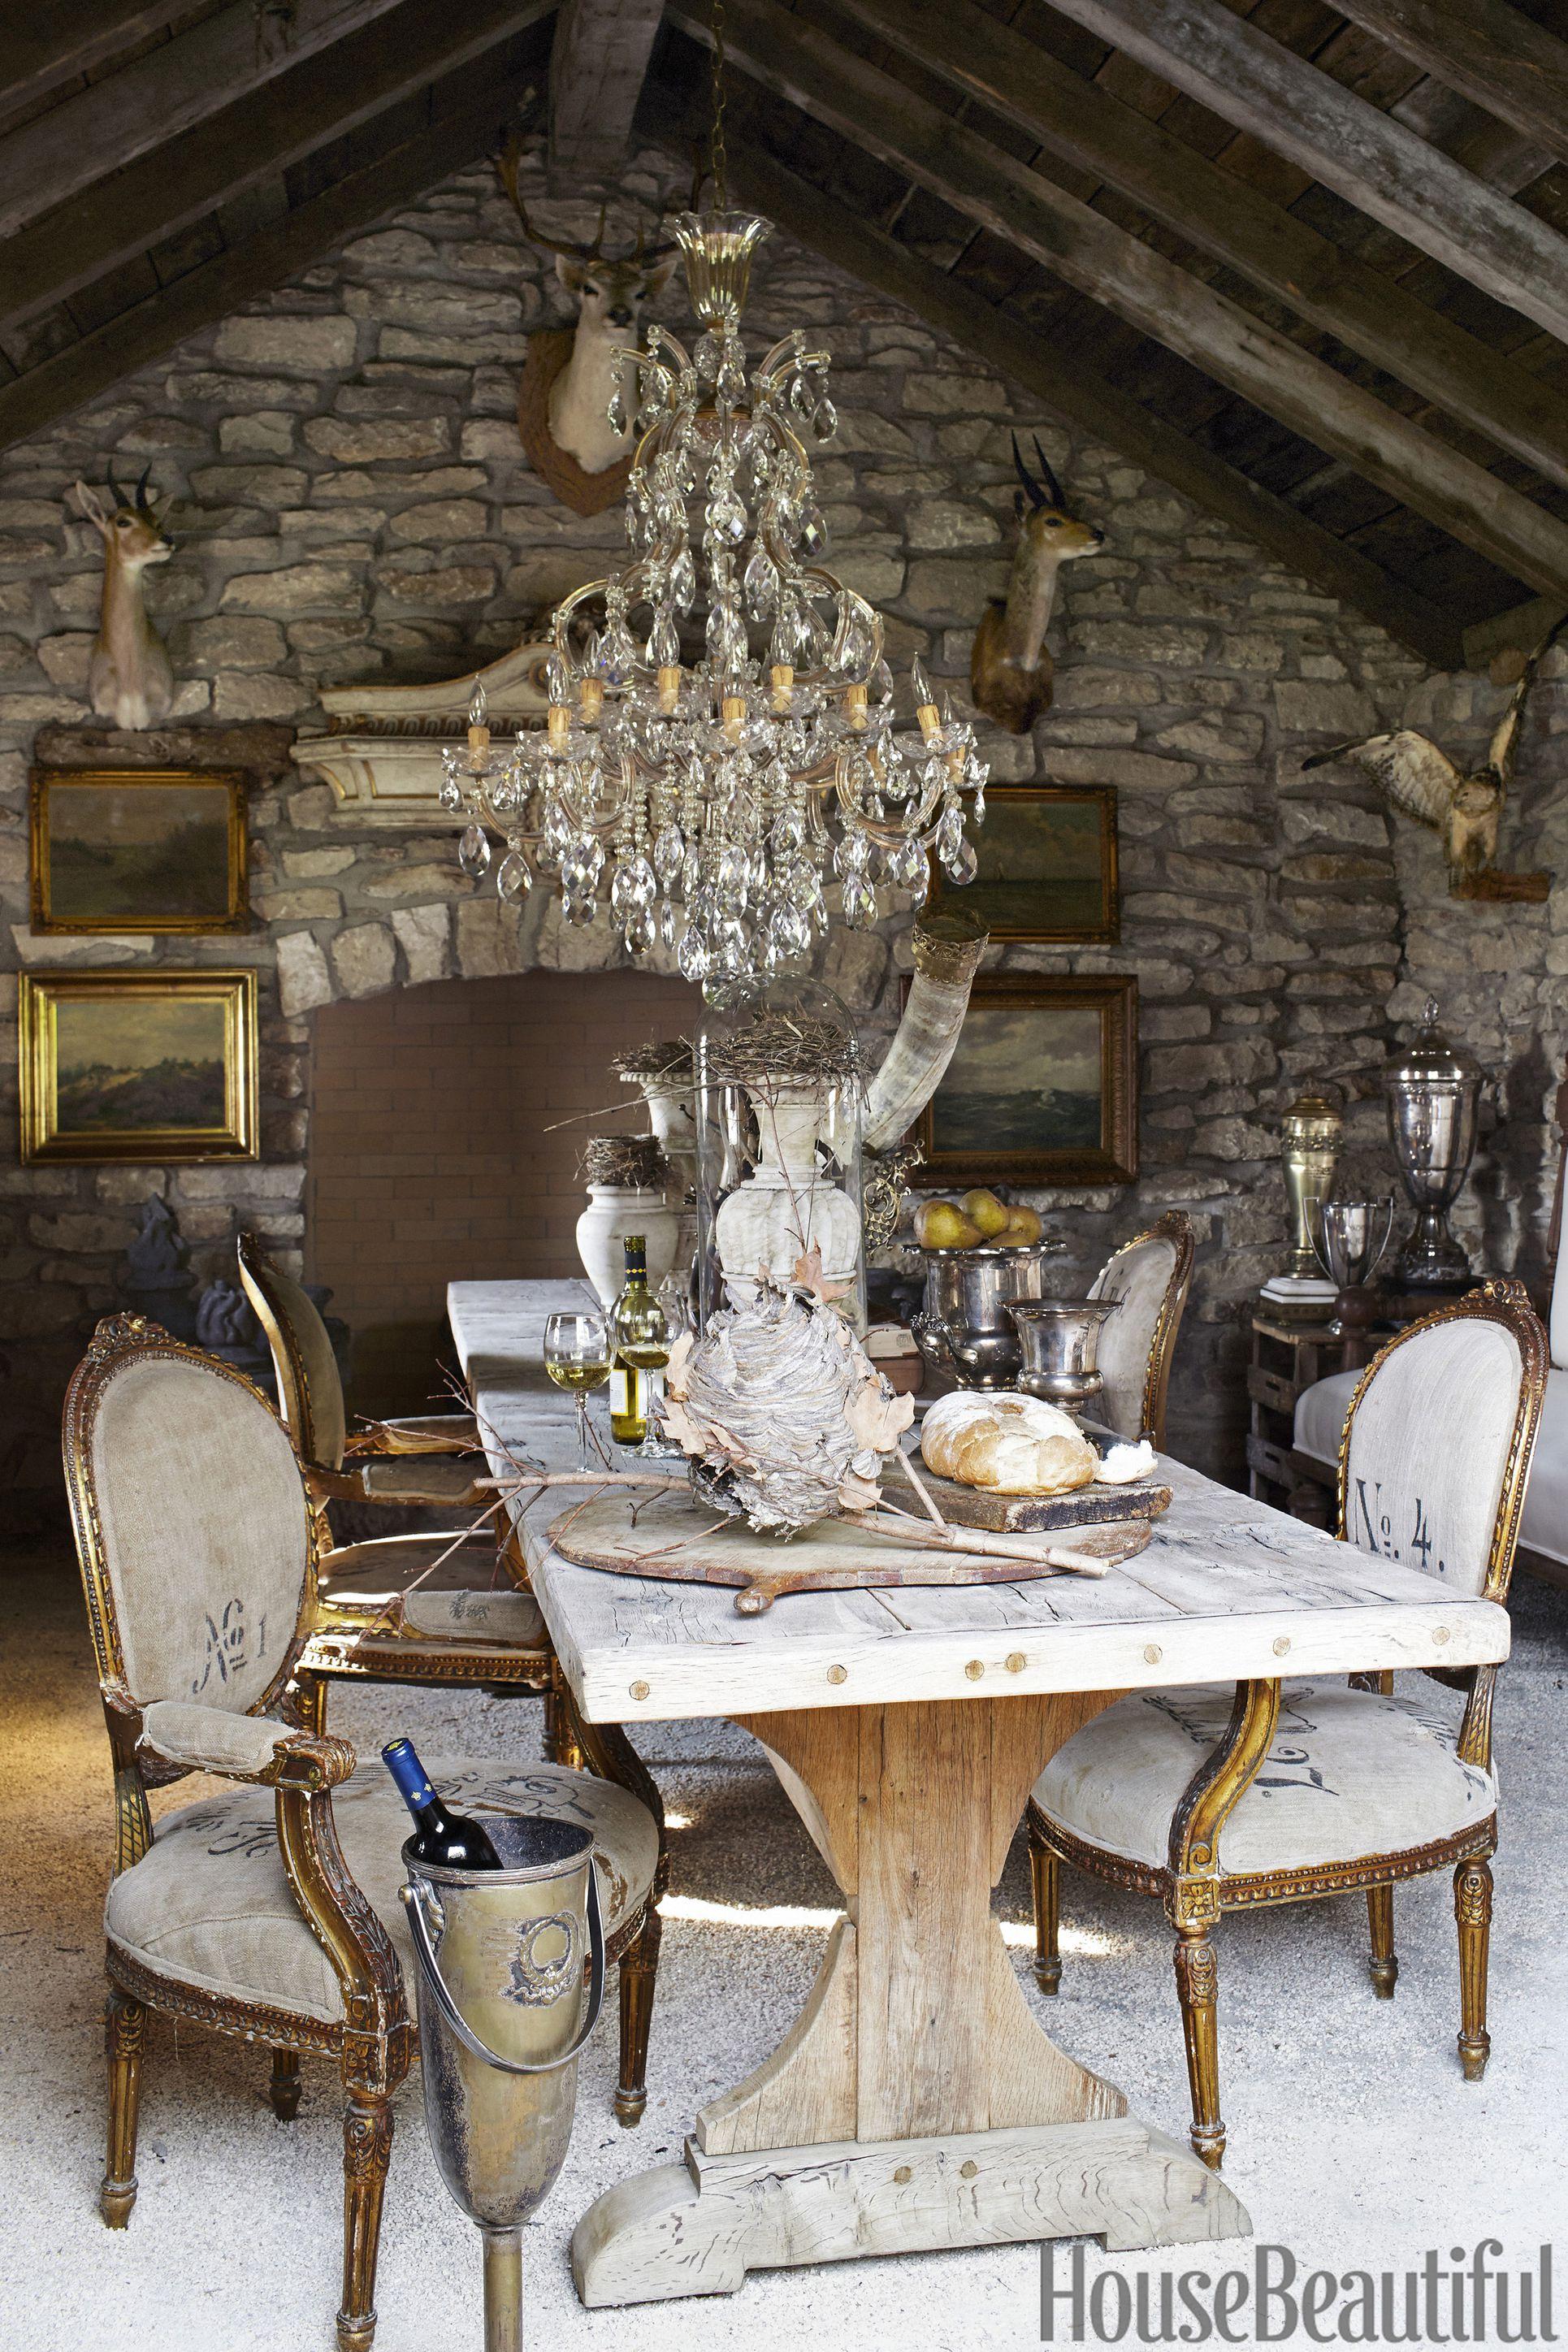 annie-brahler-smith-dining-table-0617.jpg